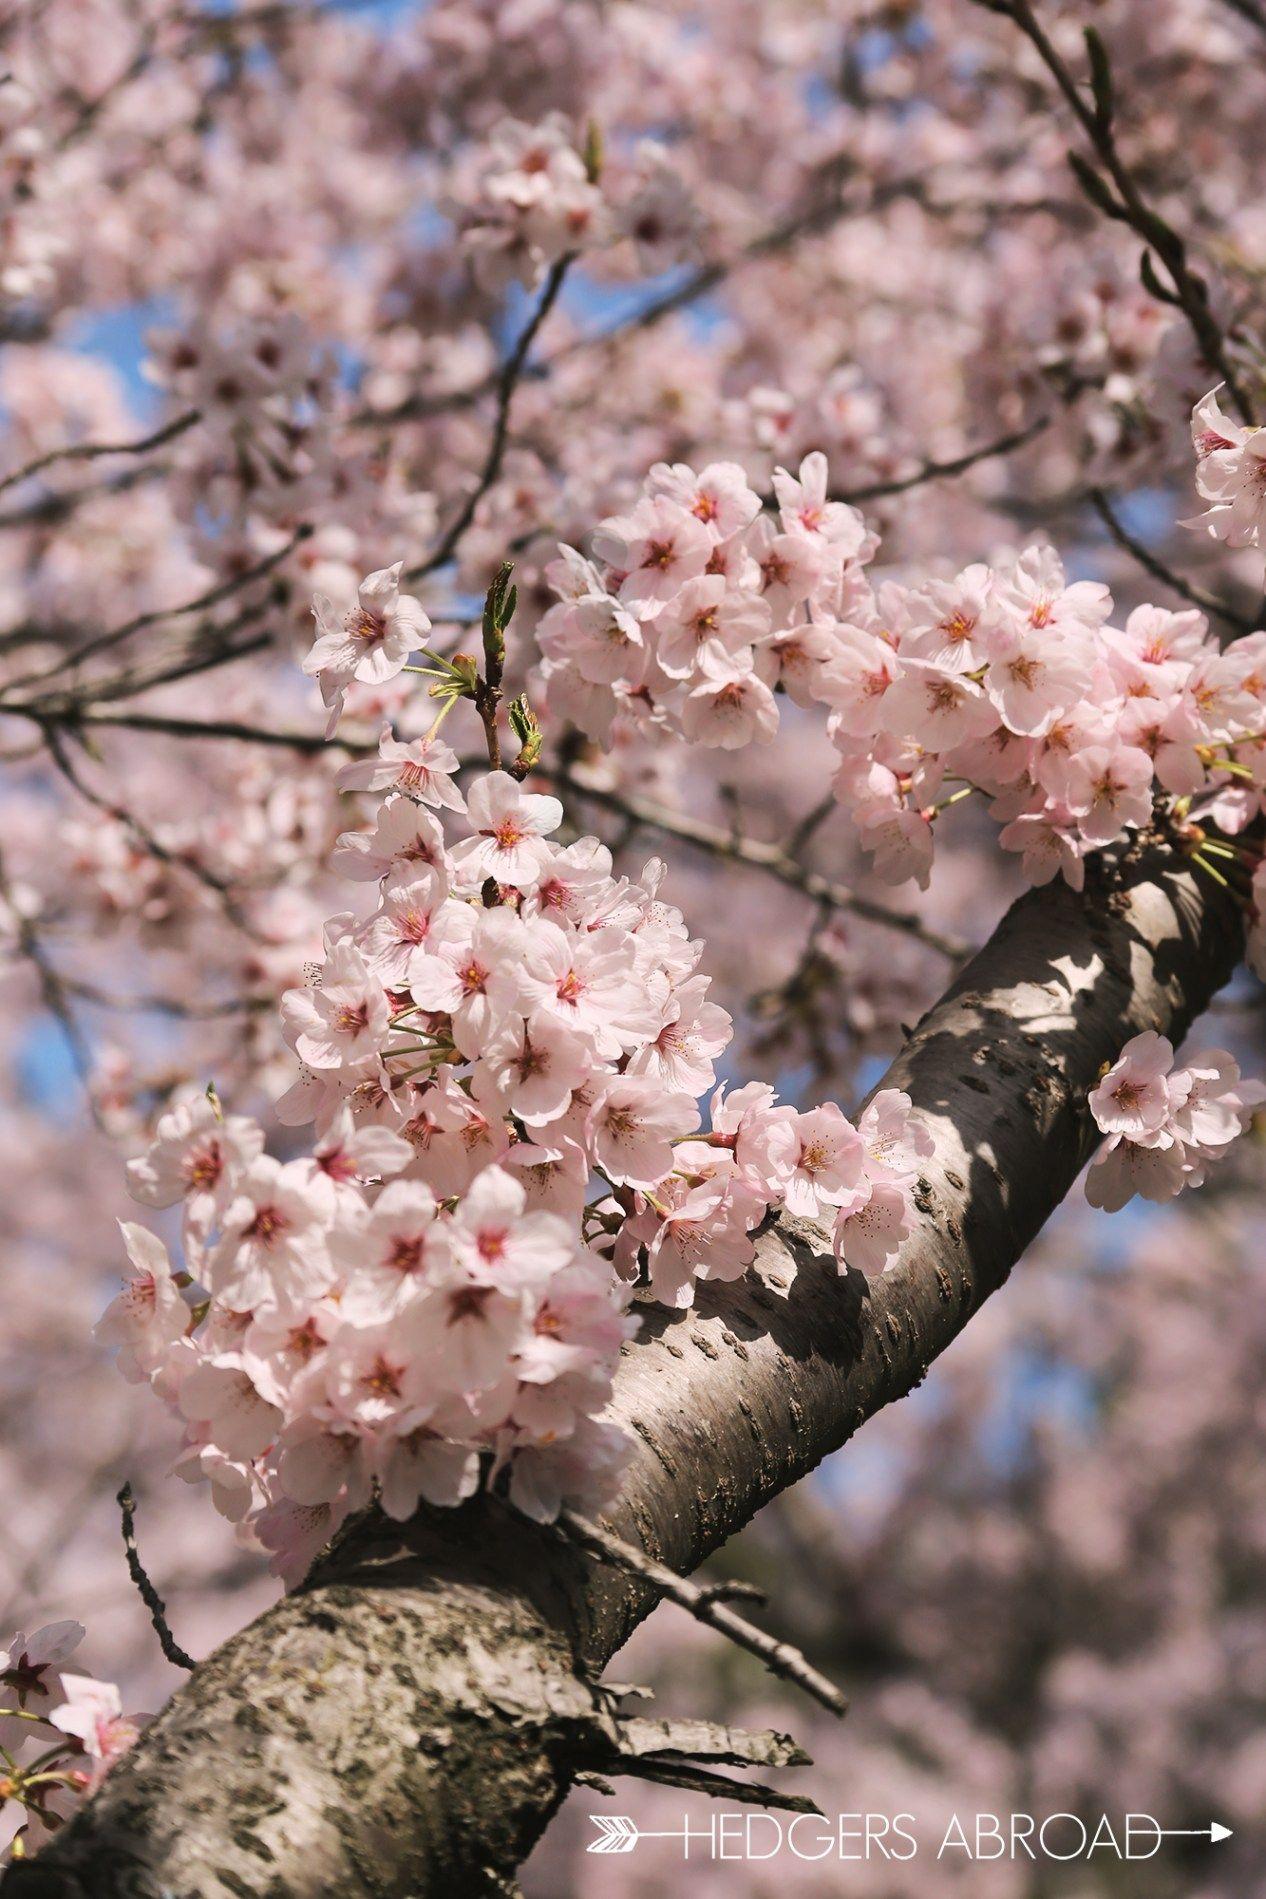 How To See The Hwagae Cherry Blossom Festival Hedgers Abroad Cherry Blossom Festival Cherry Blossom Season Flower Festival